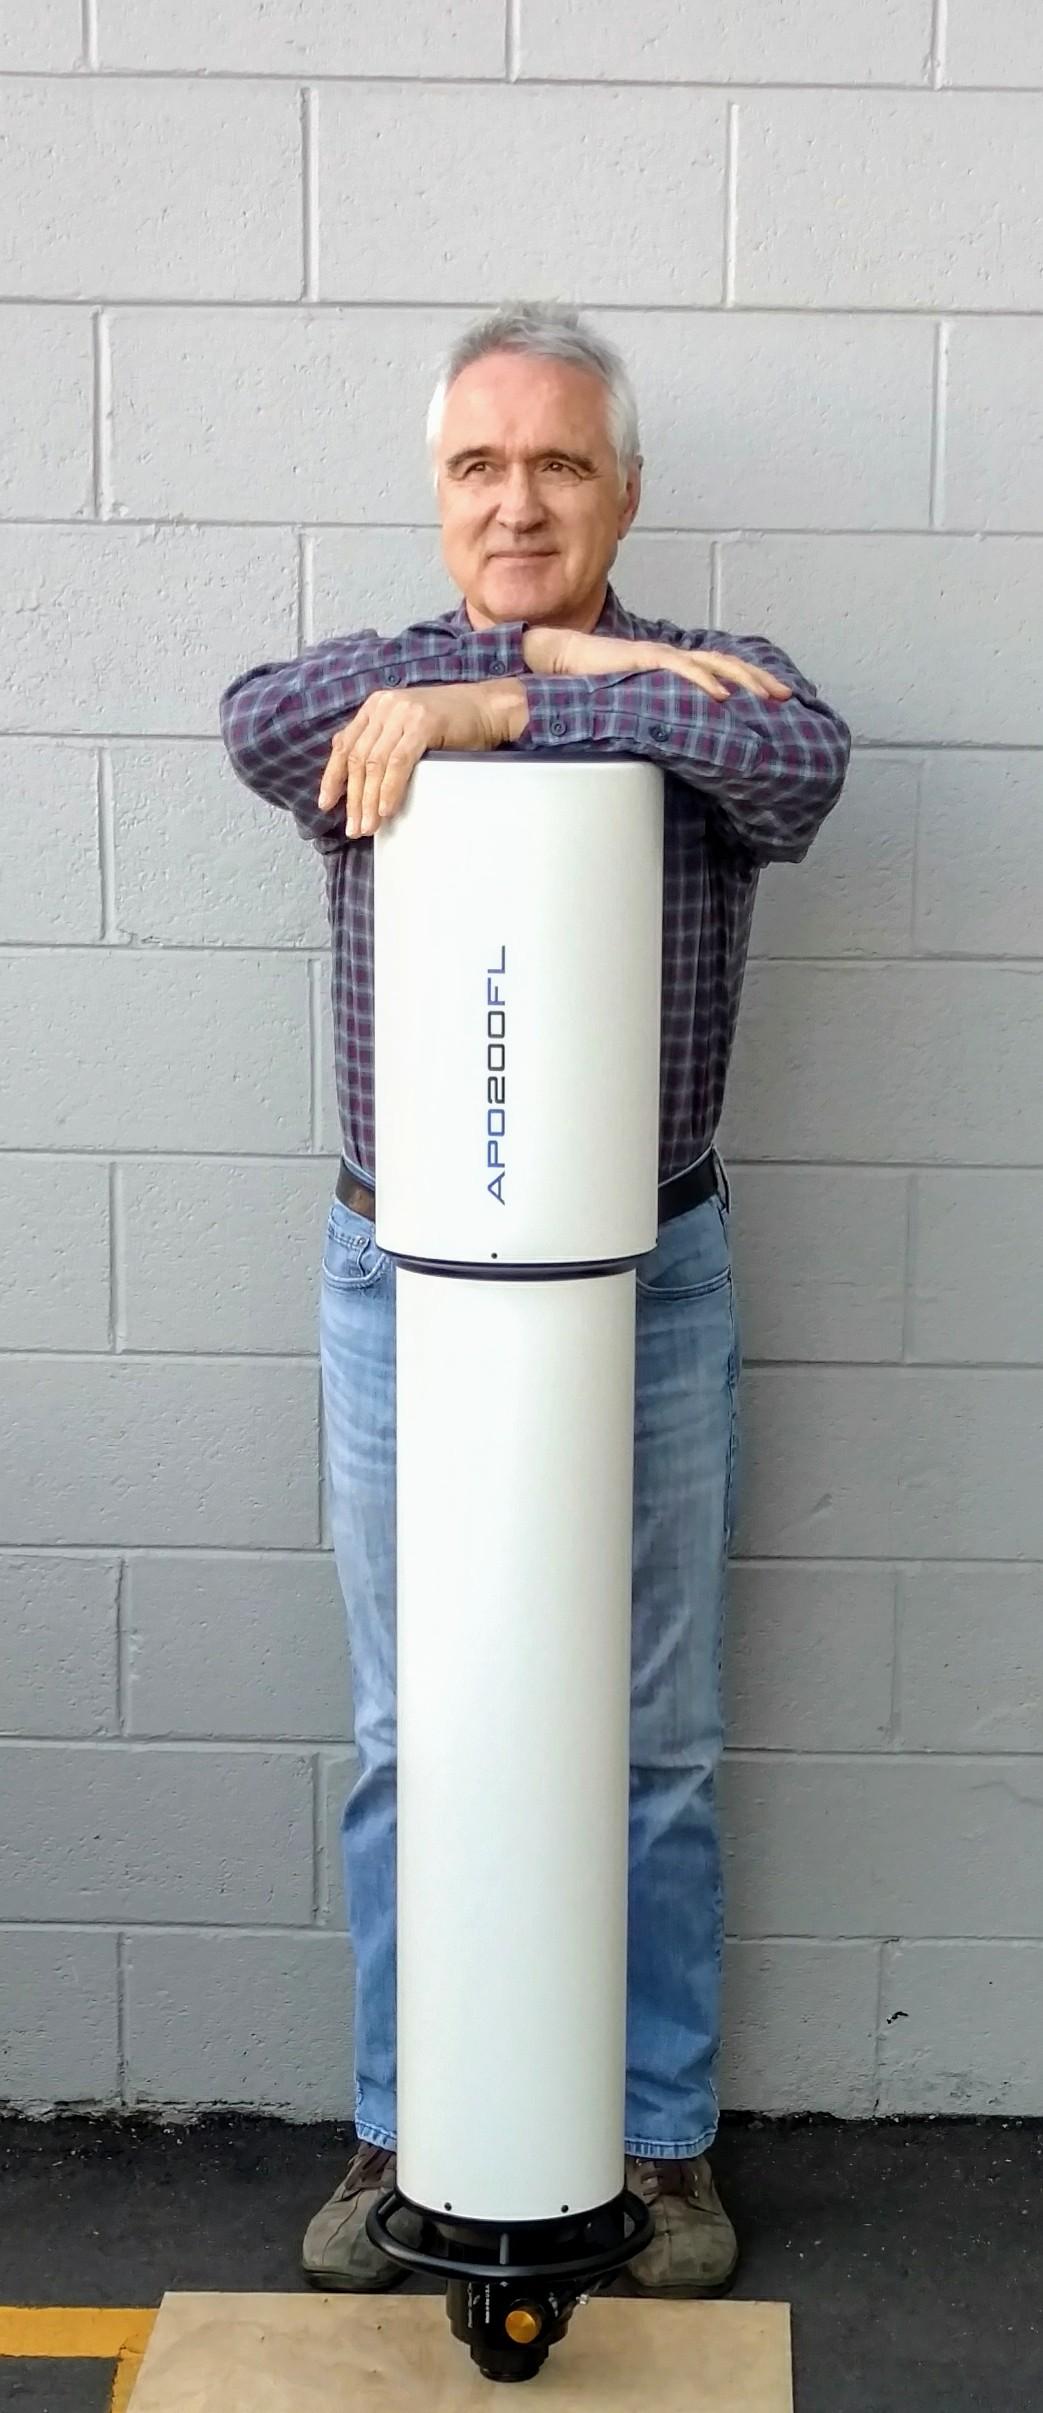 Yuri Petrunin (183 cm groß) mit einem TEC APO 200 FL